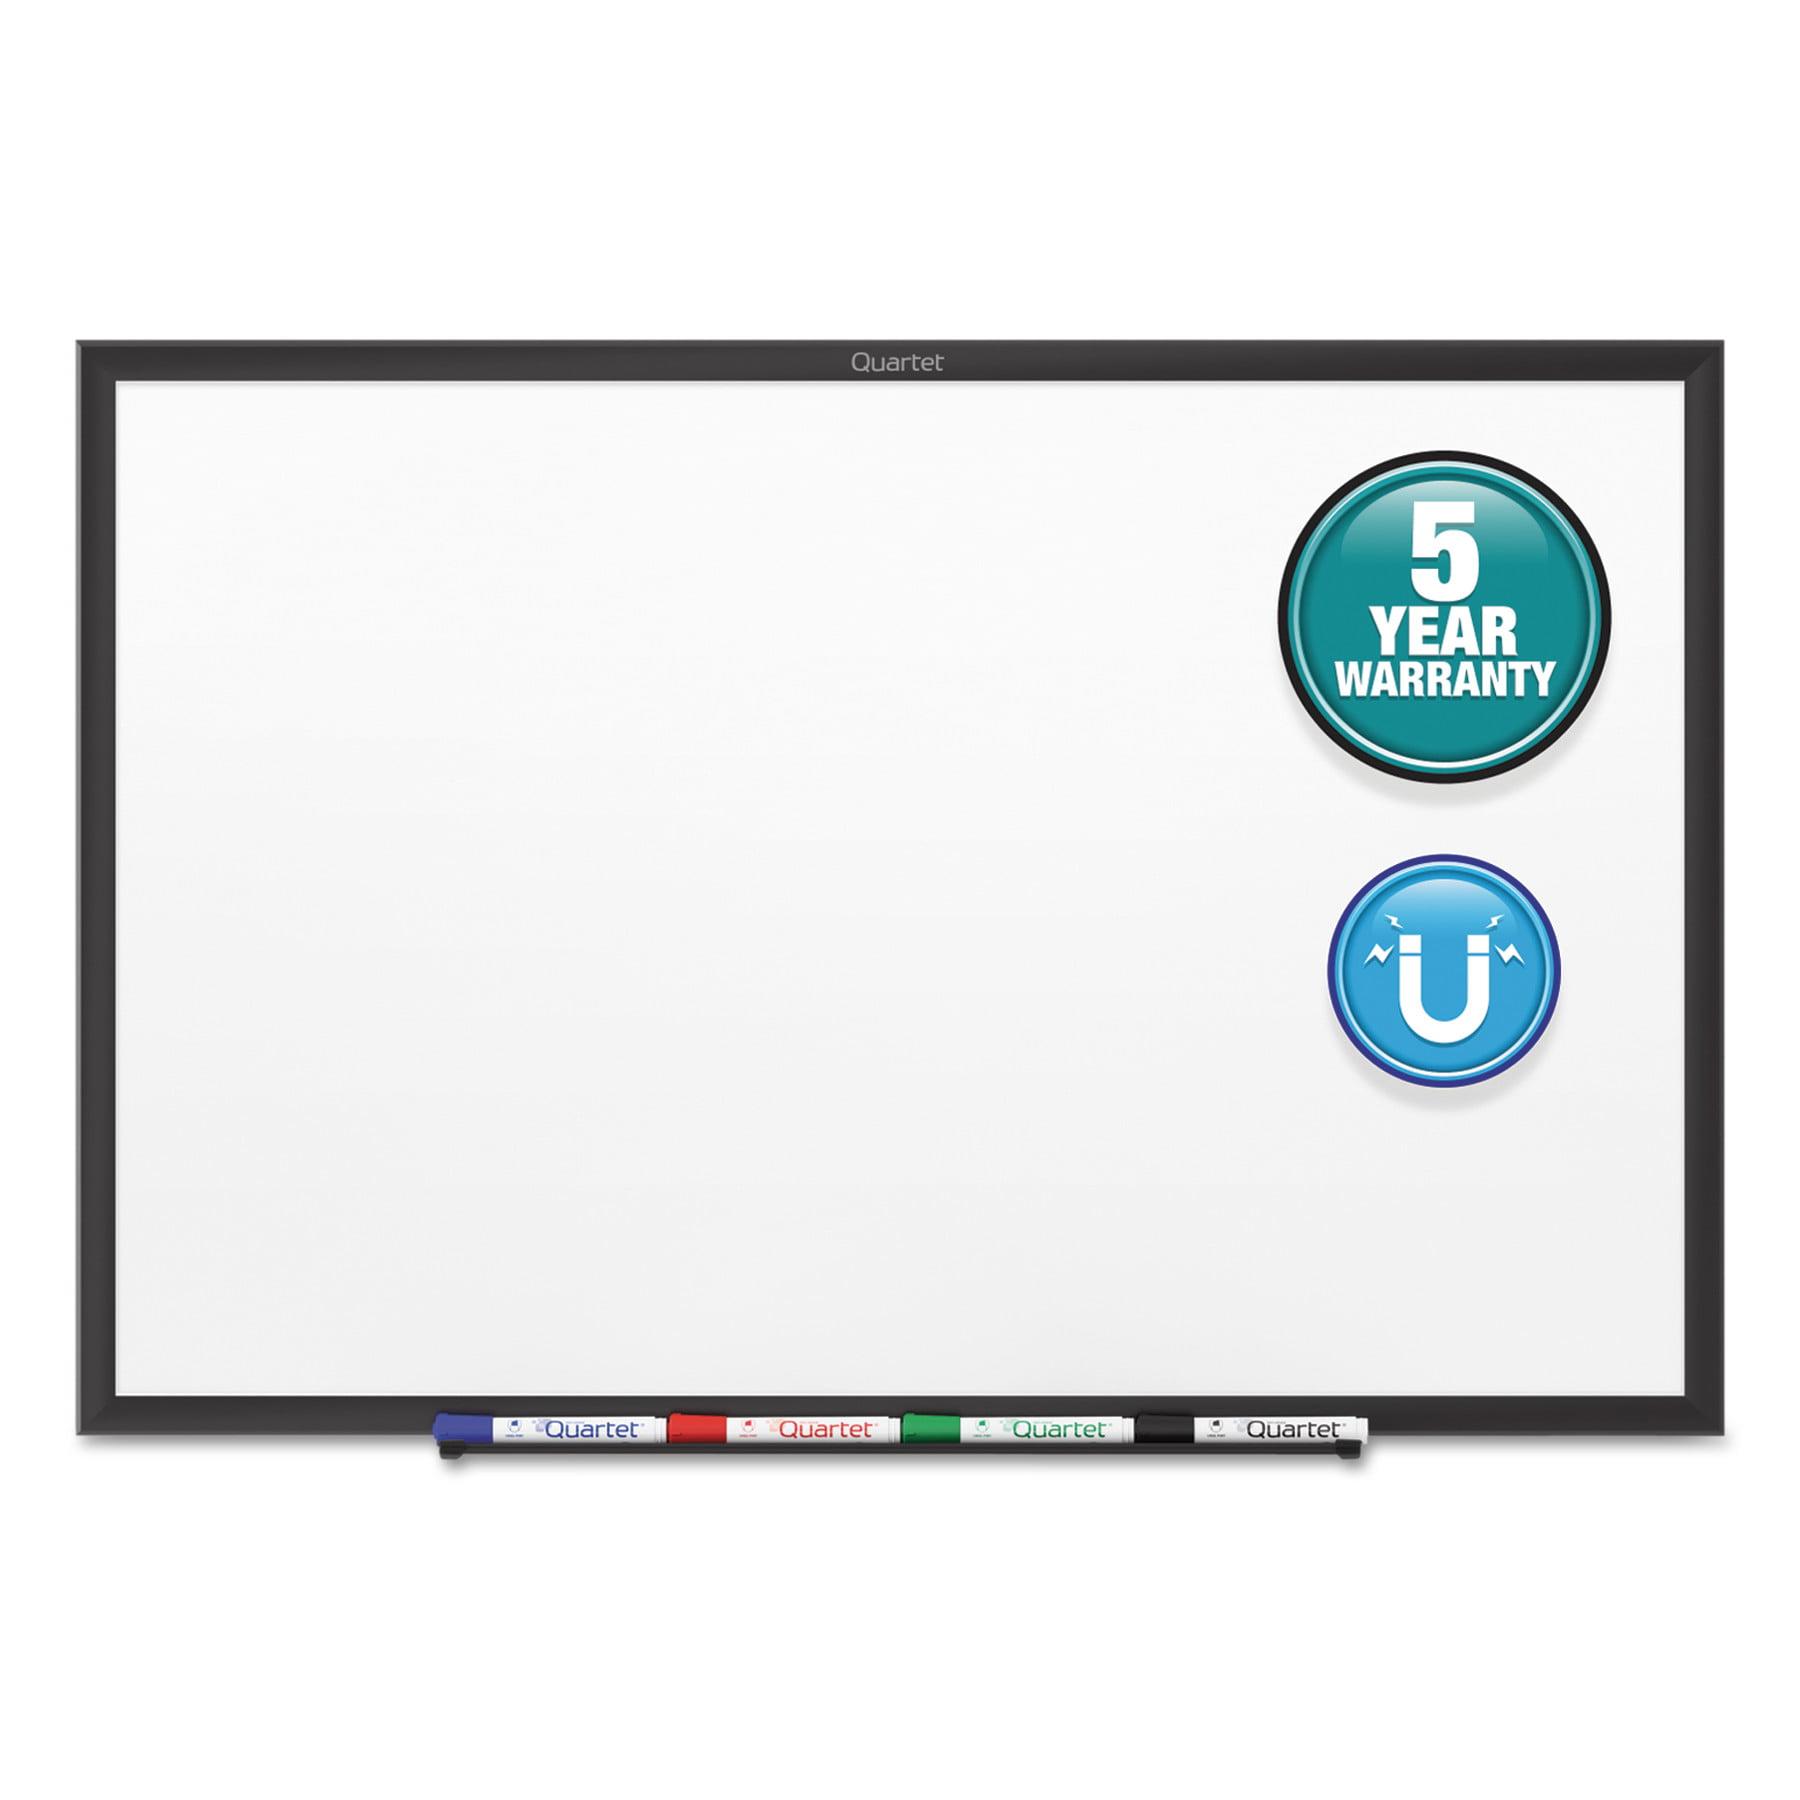 Quartet Classic Series Magnetic Whiteboard, 72 x 48, Black Aluminum Frame by QUARTET MFG.